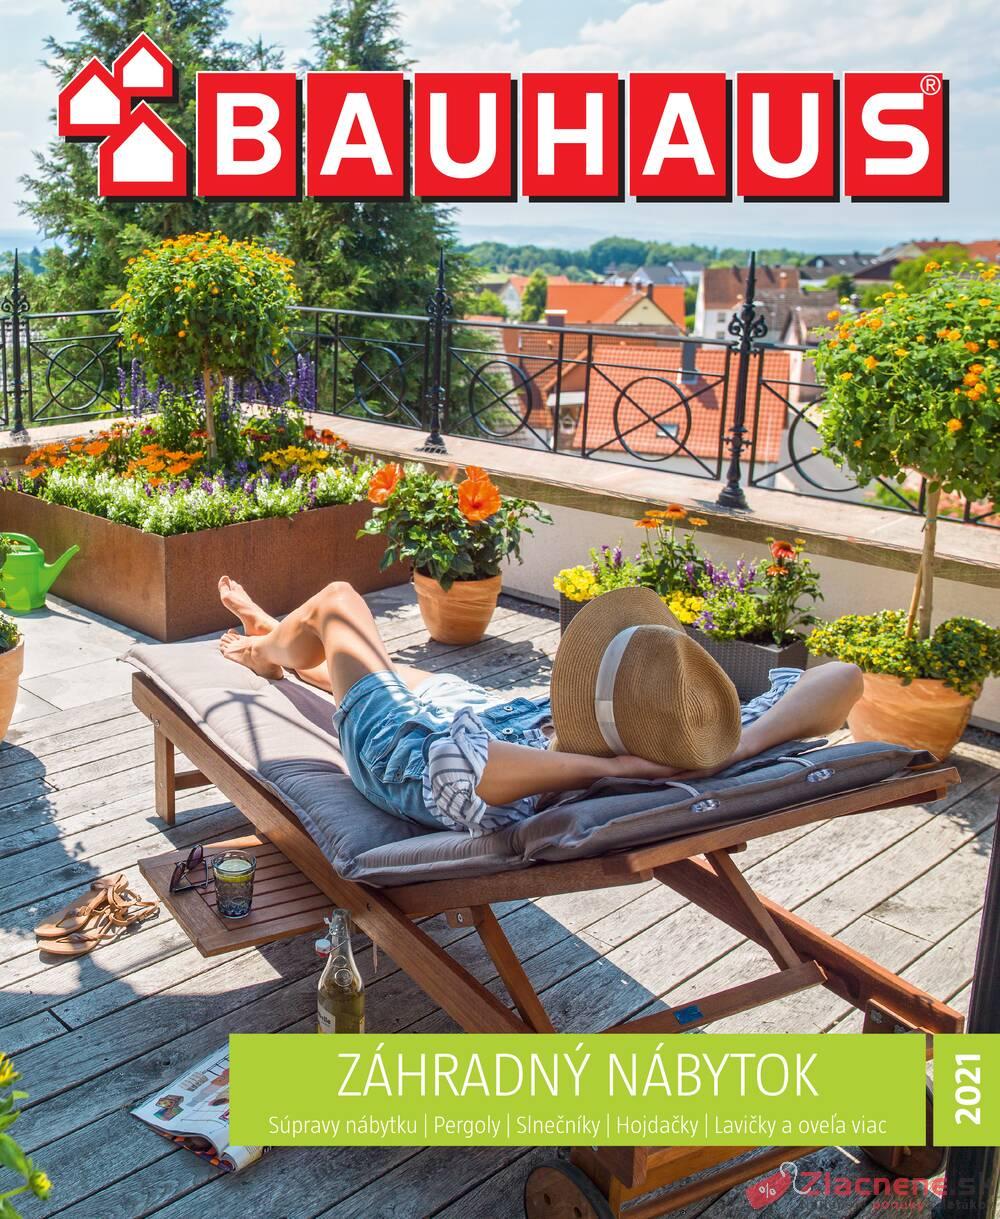 Leták Bauhaus - Bauhaus Zahradný nábytok 8.3. - 30.6. - strana 1